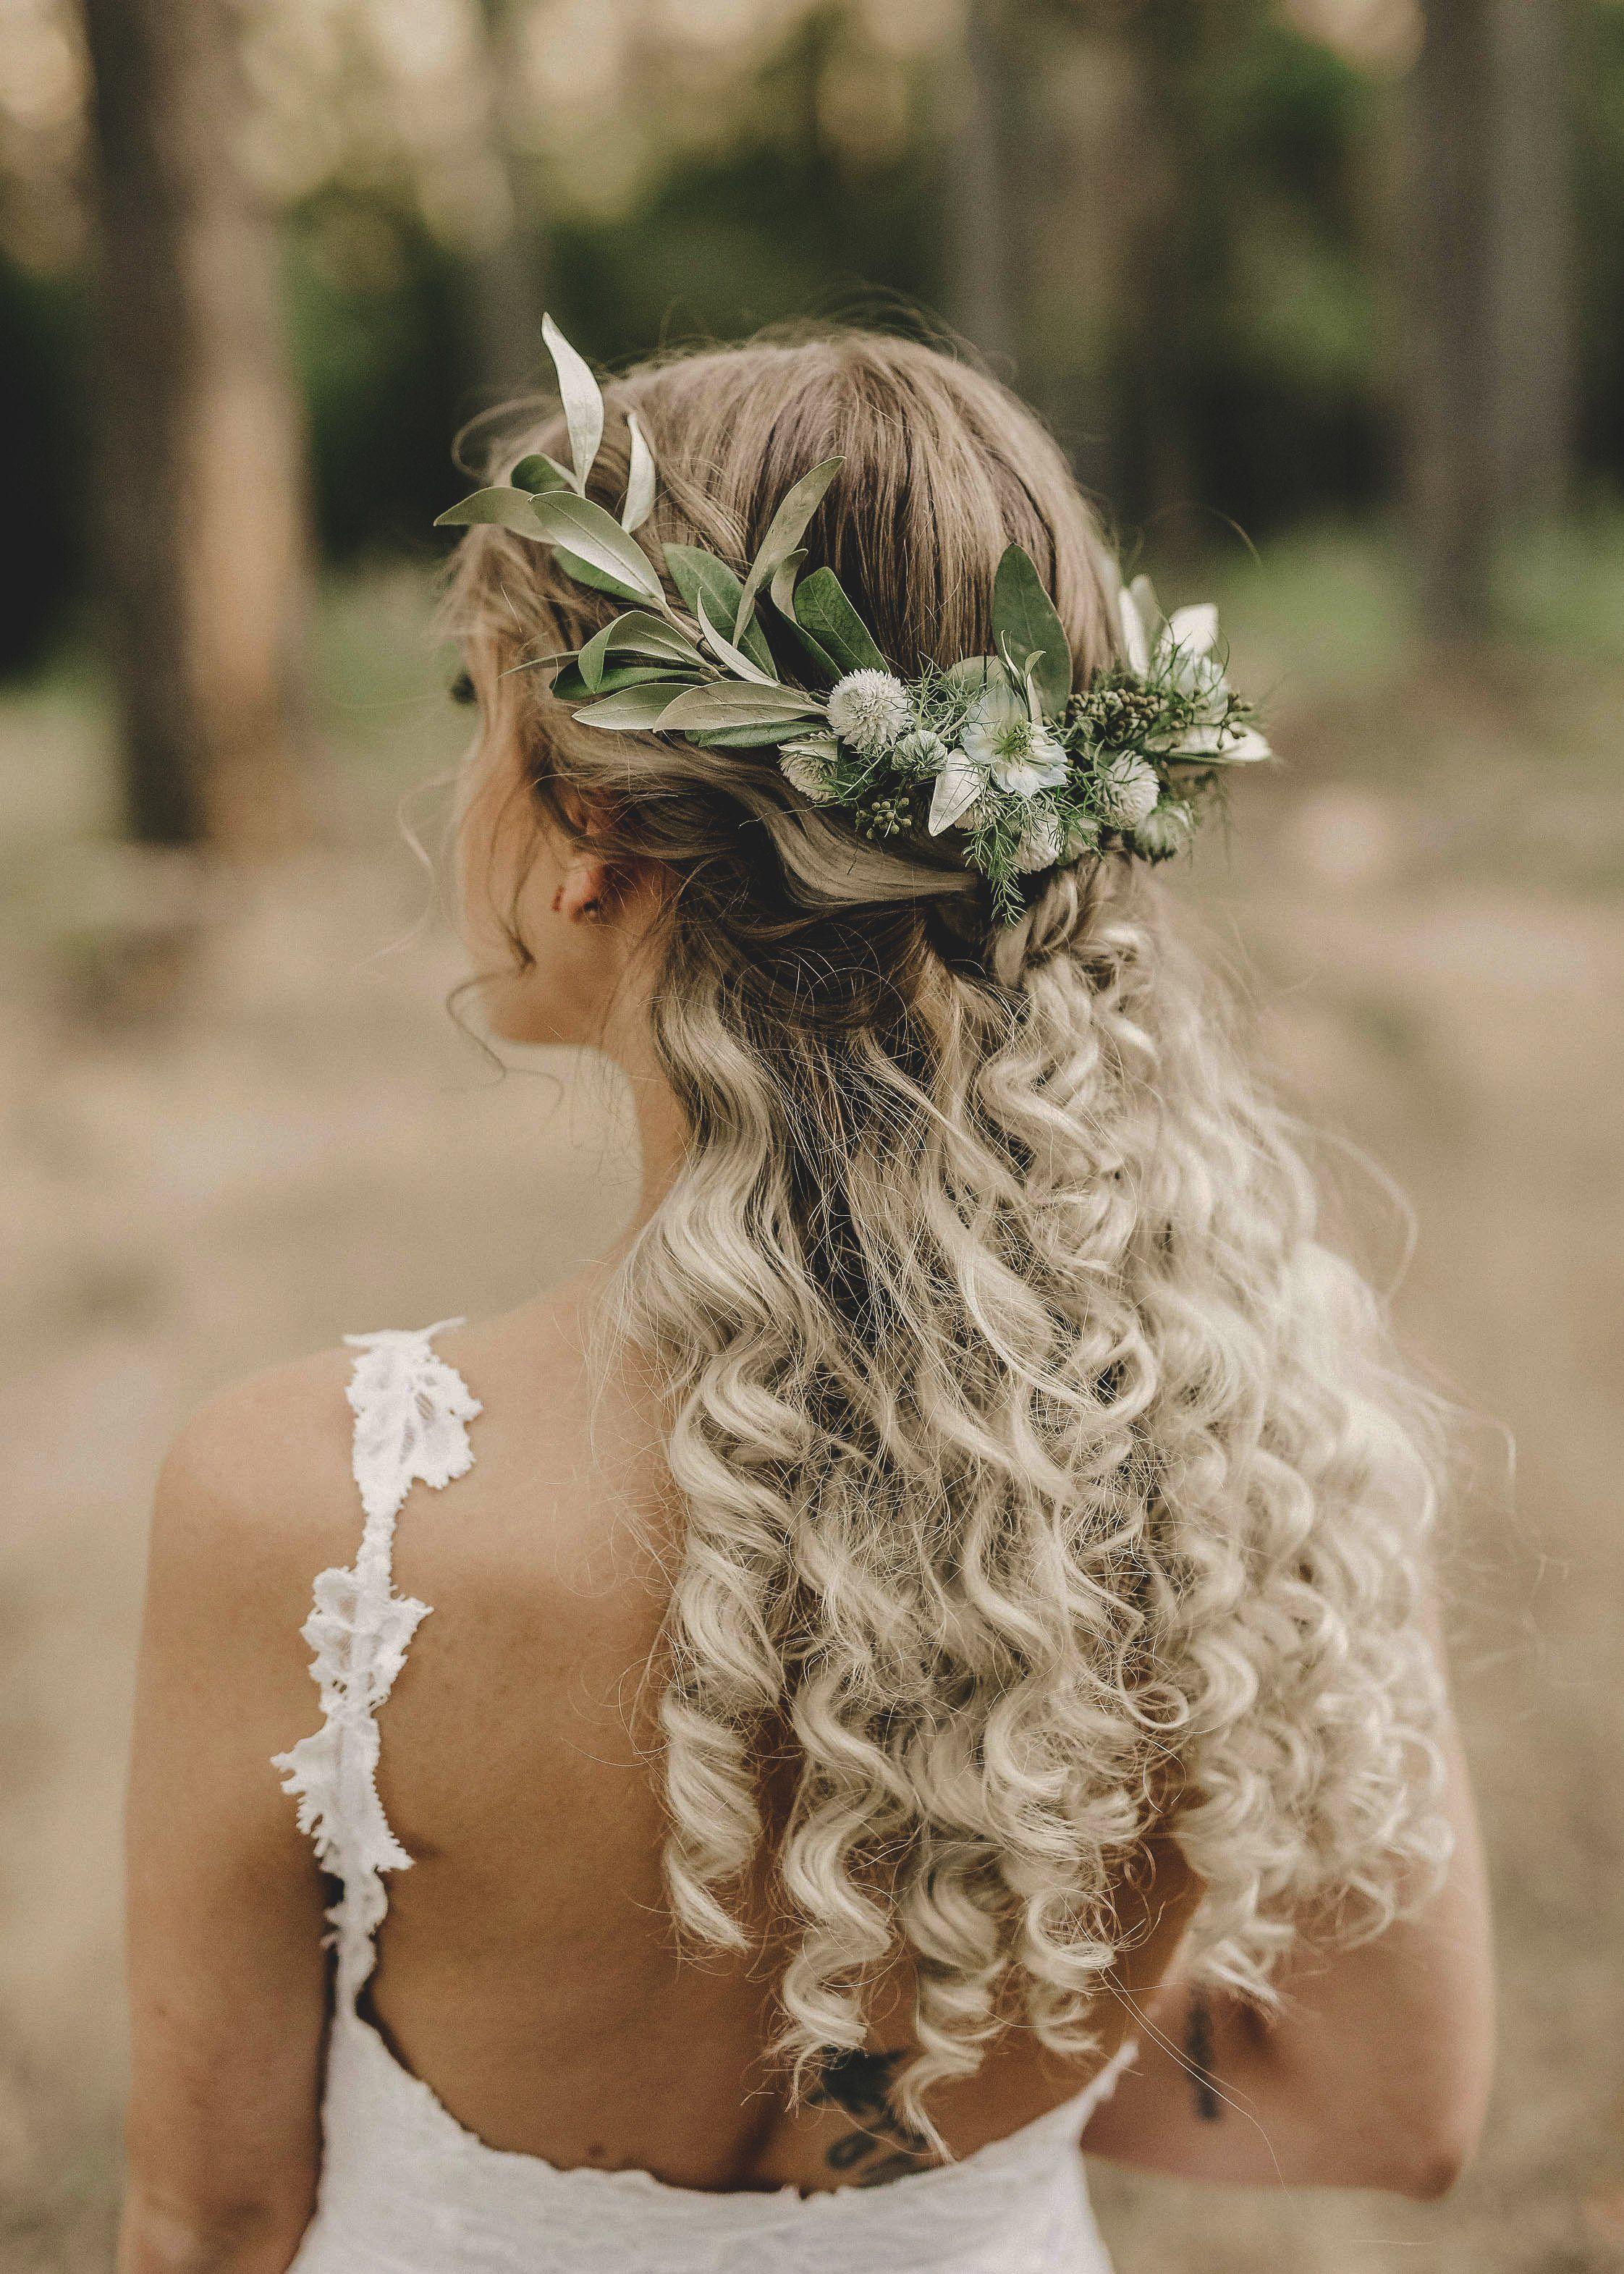 Emma Dress Wearyourlove French Lace Wedding Dress Wear Your